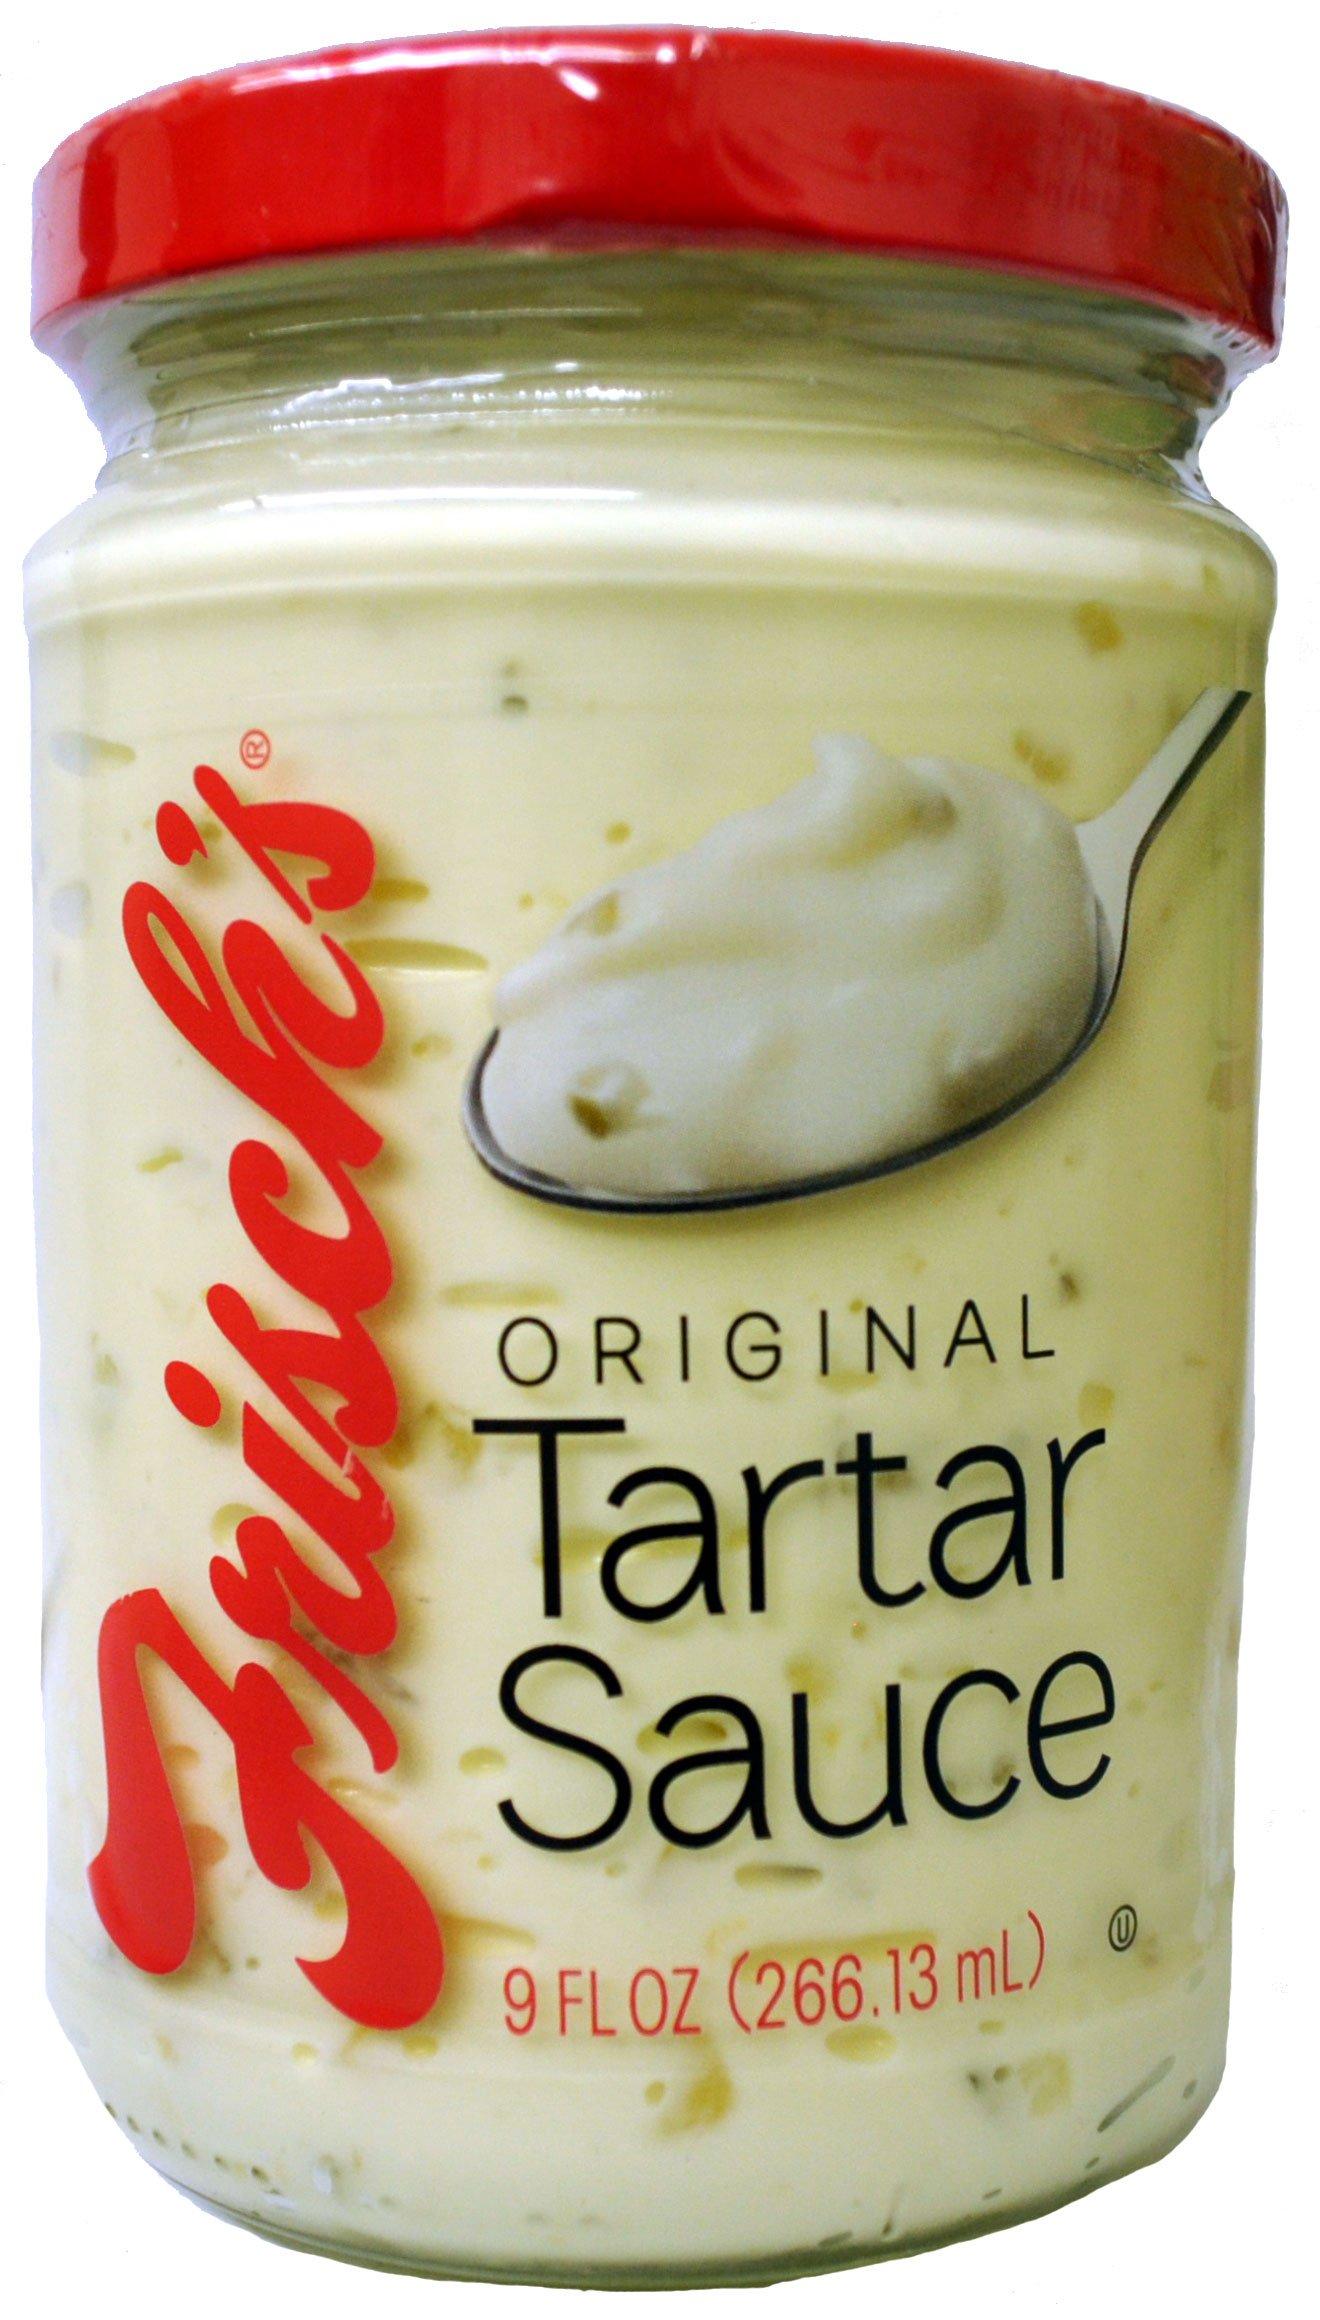 Frisch's Big Boy Original Tartar Sauce (2 - 9oz Jars)